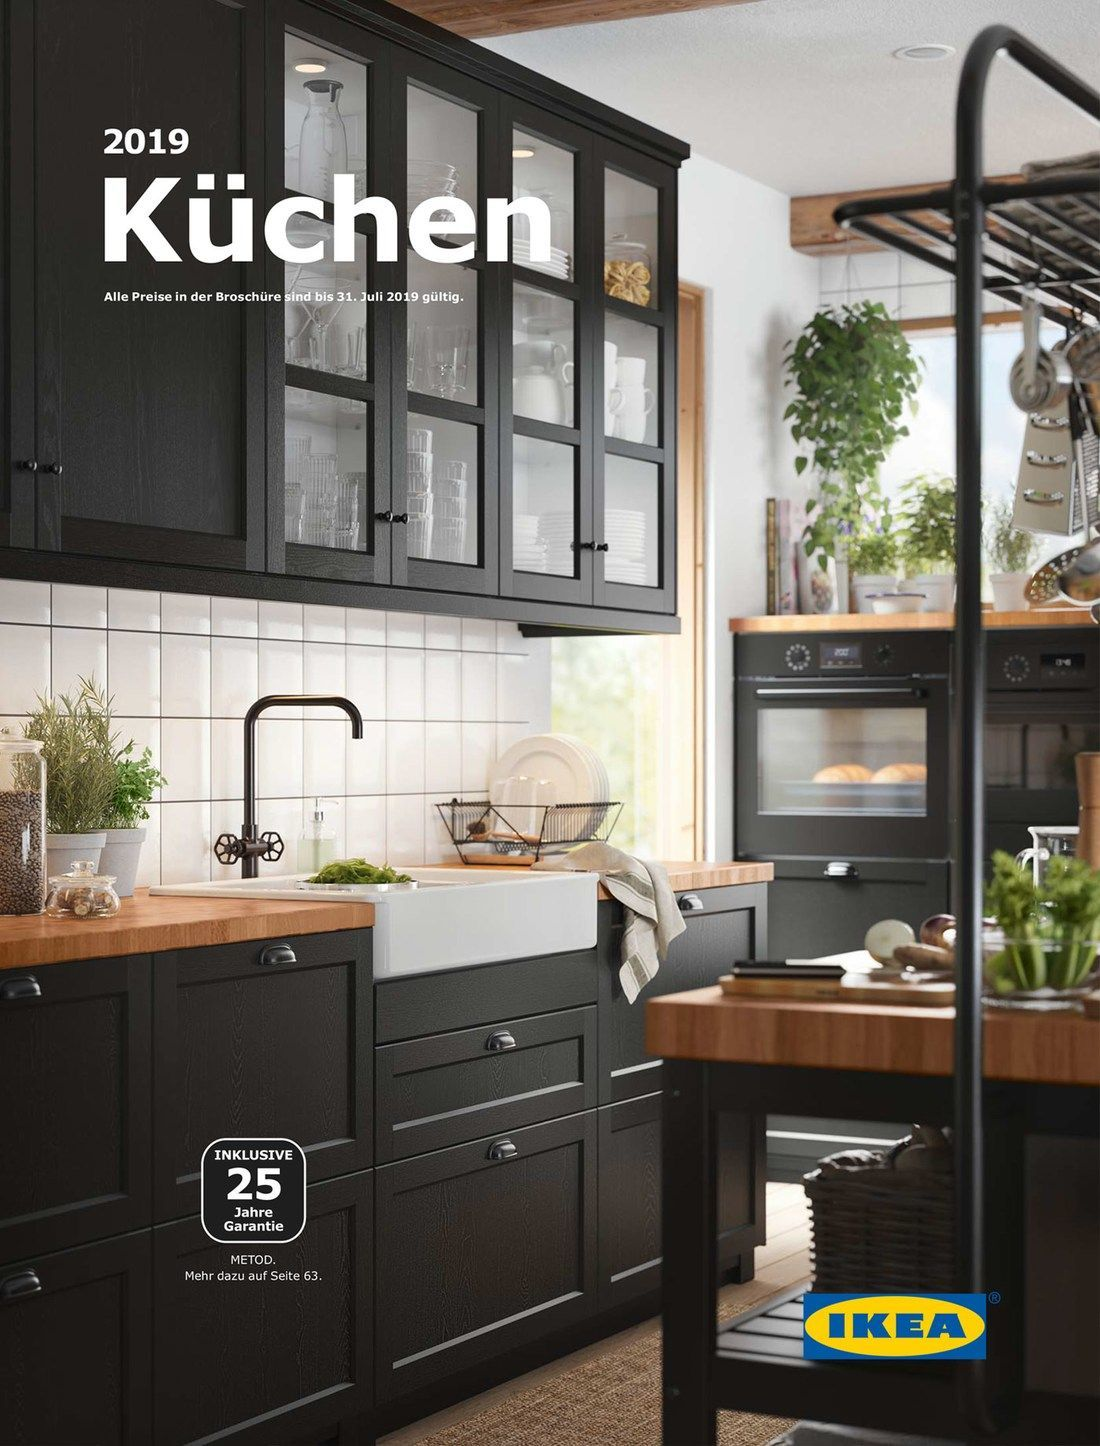 Katalog für 2019 Ikea, Amerikan mutfak, Siyah mutfaklar